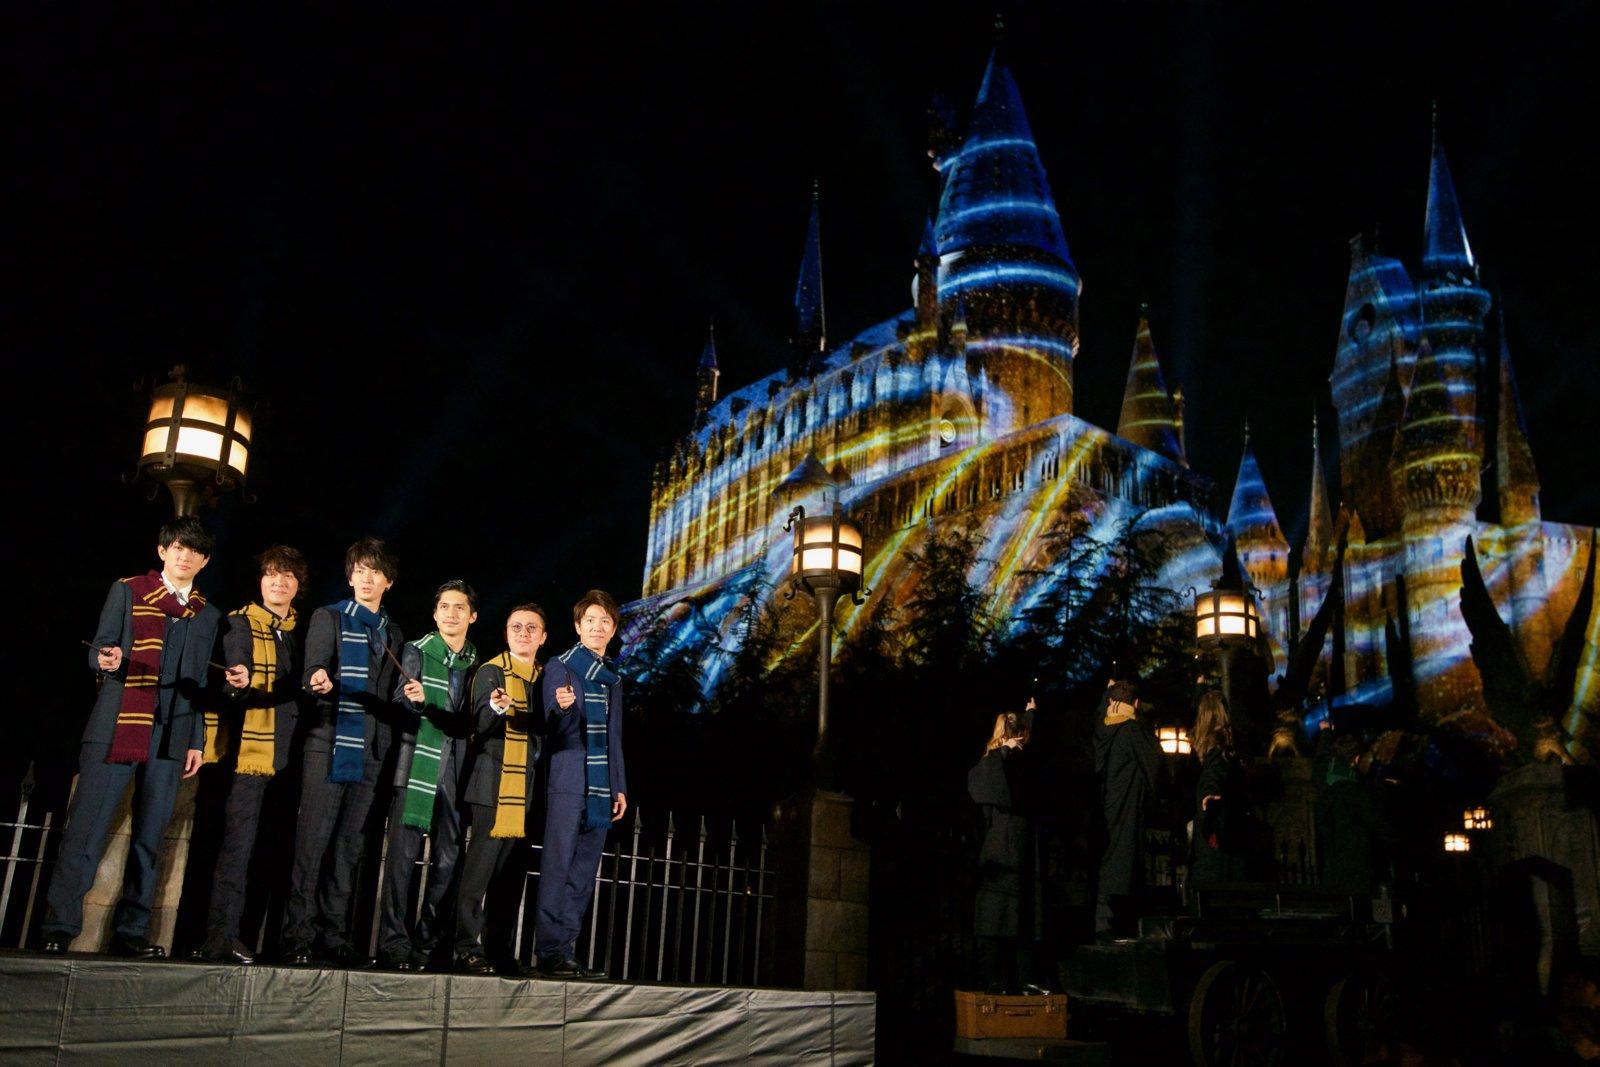 #USJ 関ジャニ∞ がセレモニーに参戦!ハリー・ポッター最大の魔法が解禁  を公開。#関ジャニ #関ジャニエイト #エイト